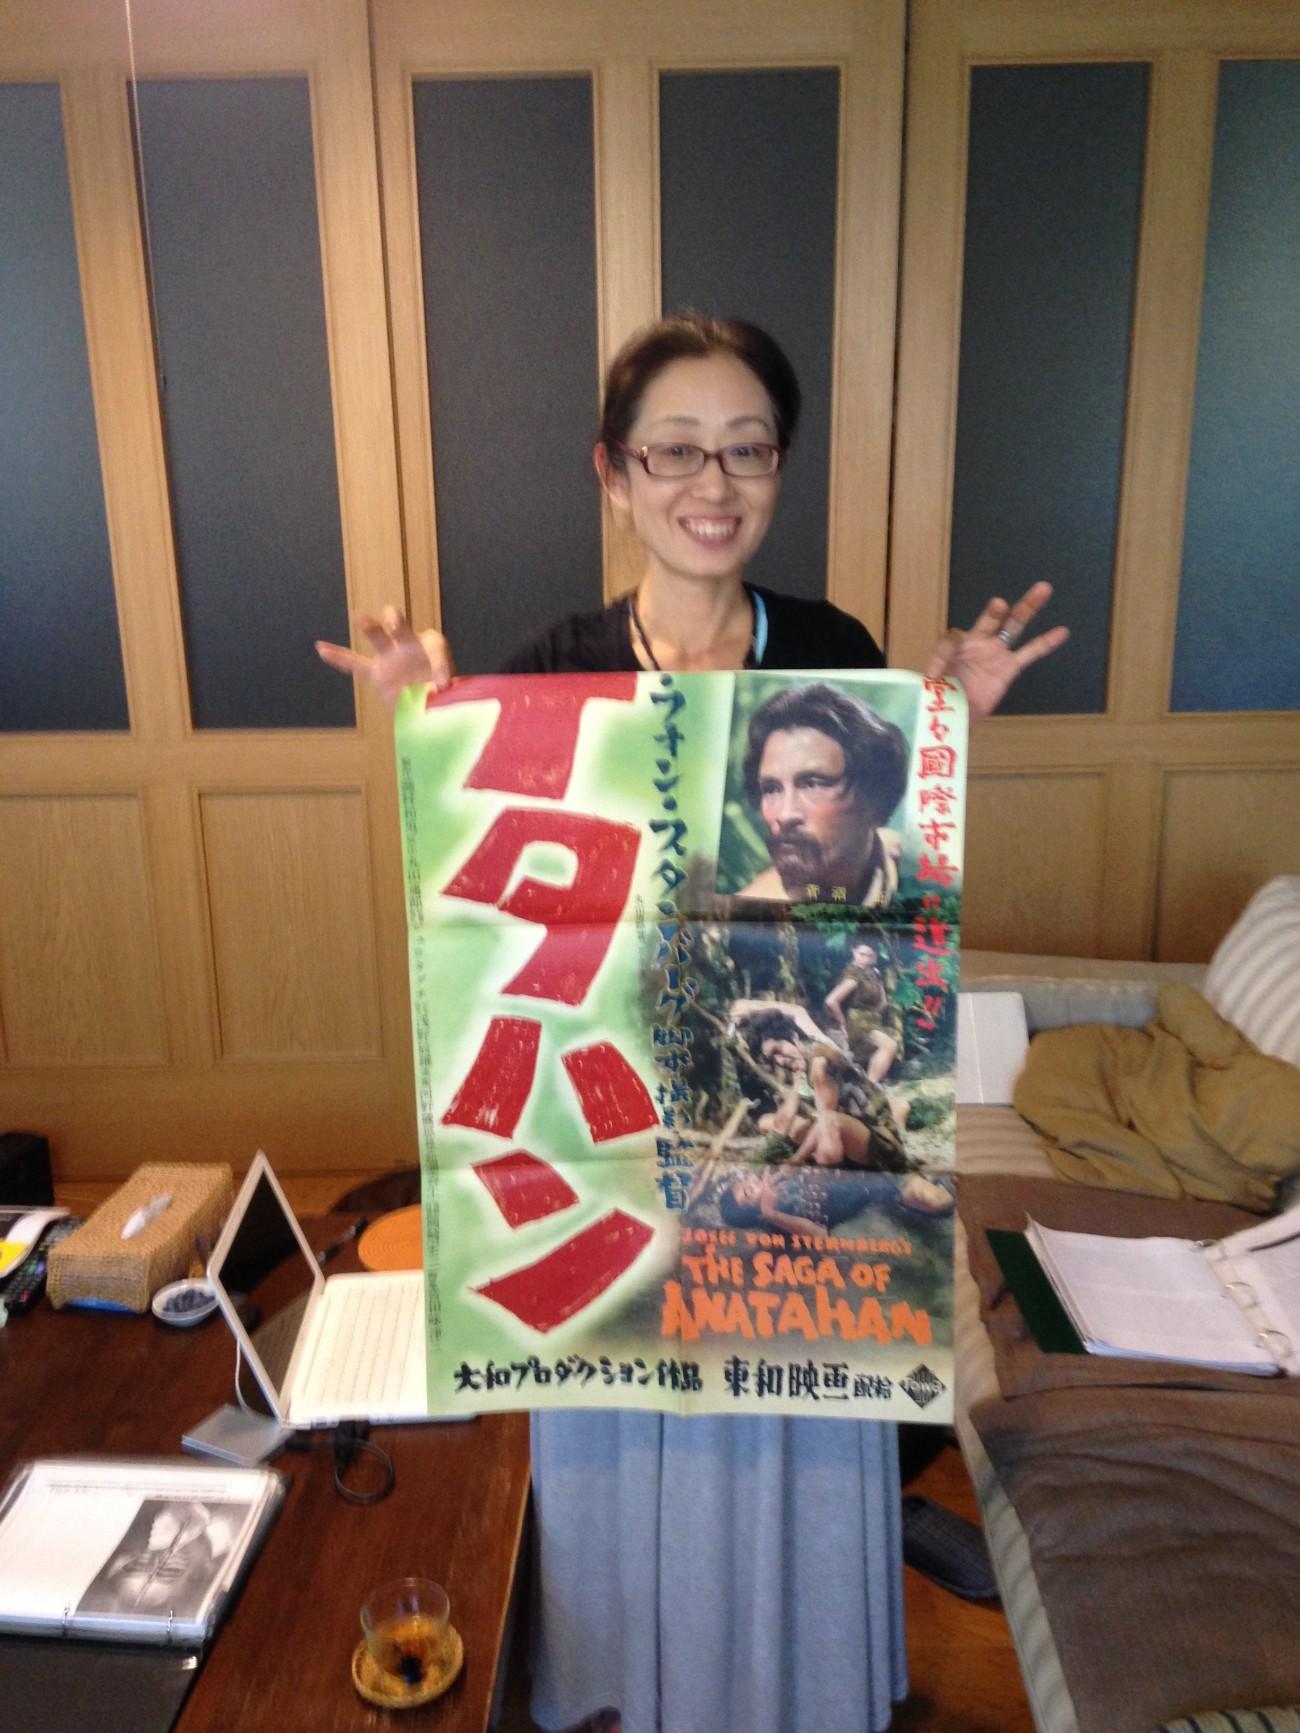 Sachiko Mizuno, à son domicile, tenant une affiche du film.